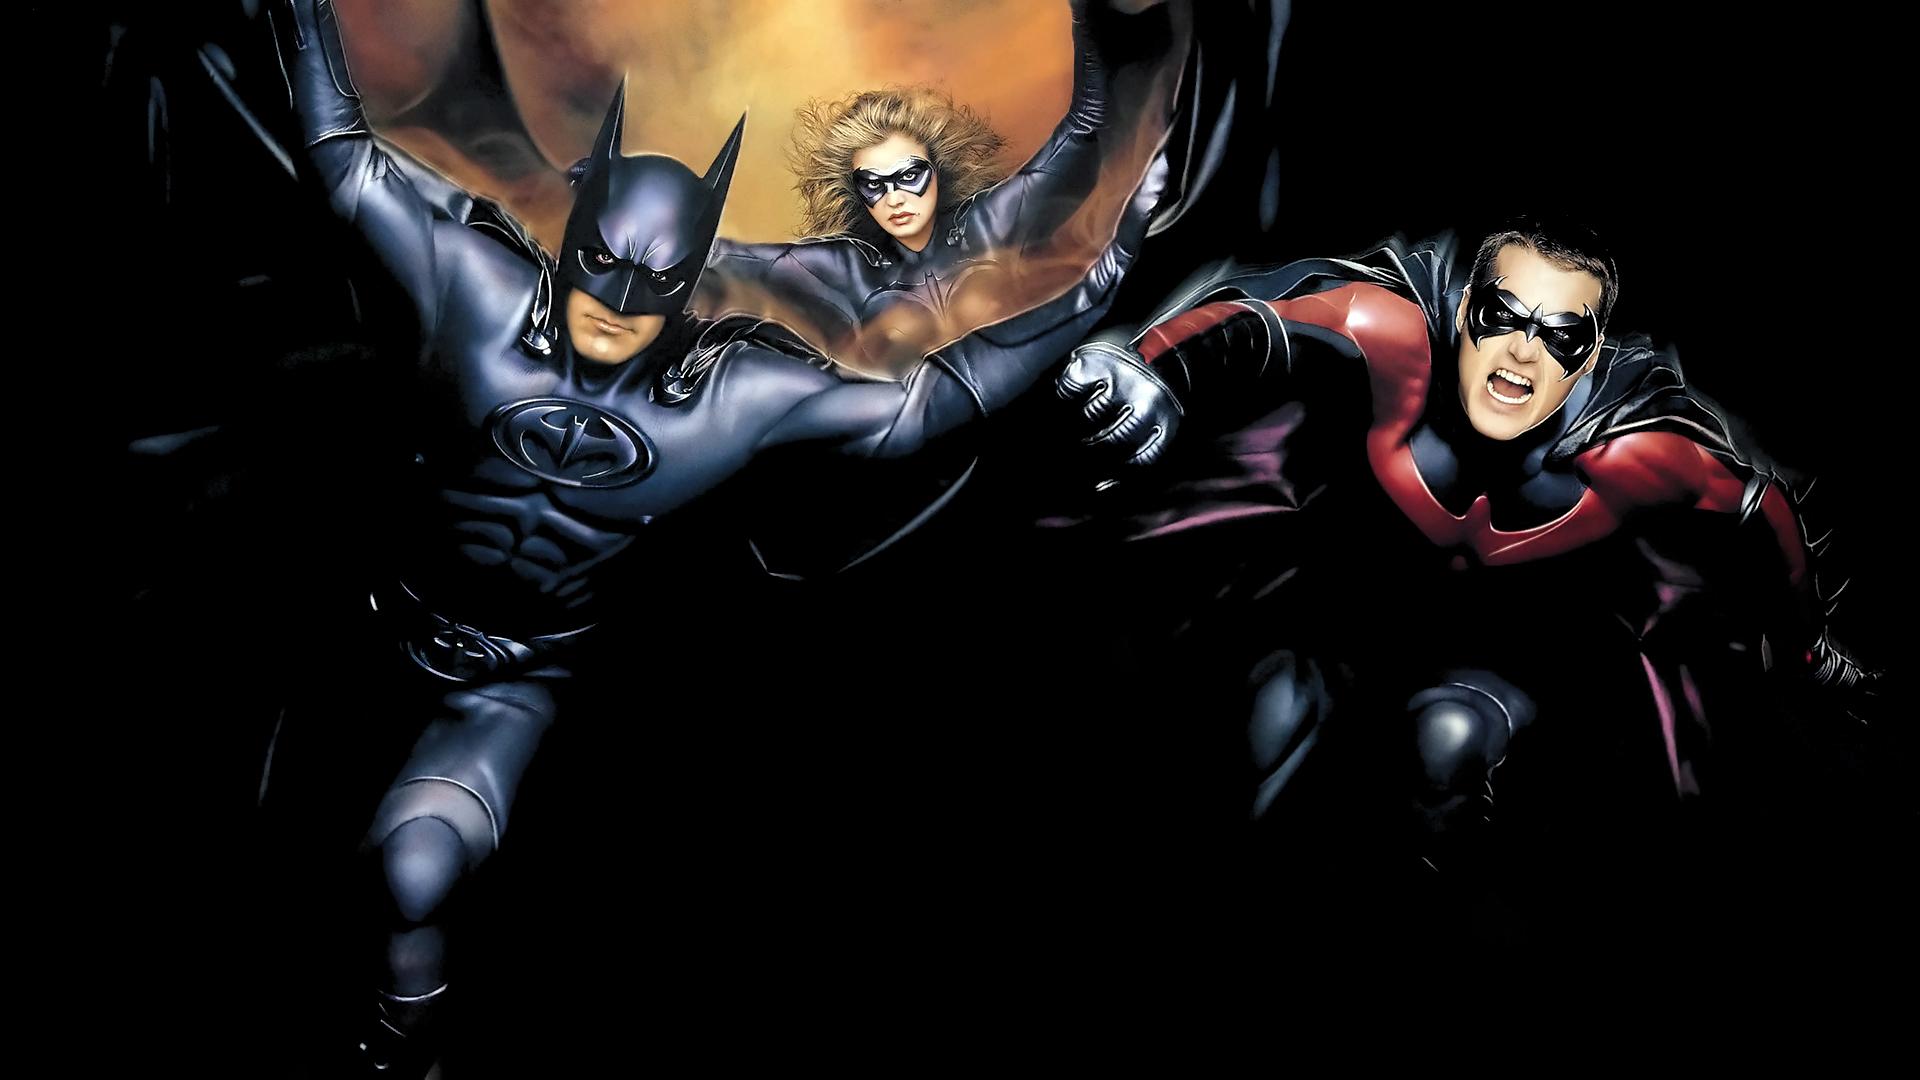 Batman robin movie fanart - Image de batman et robin ...